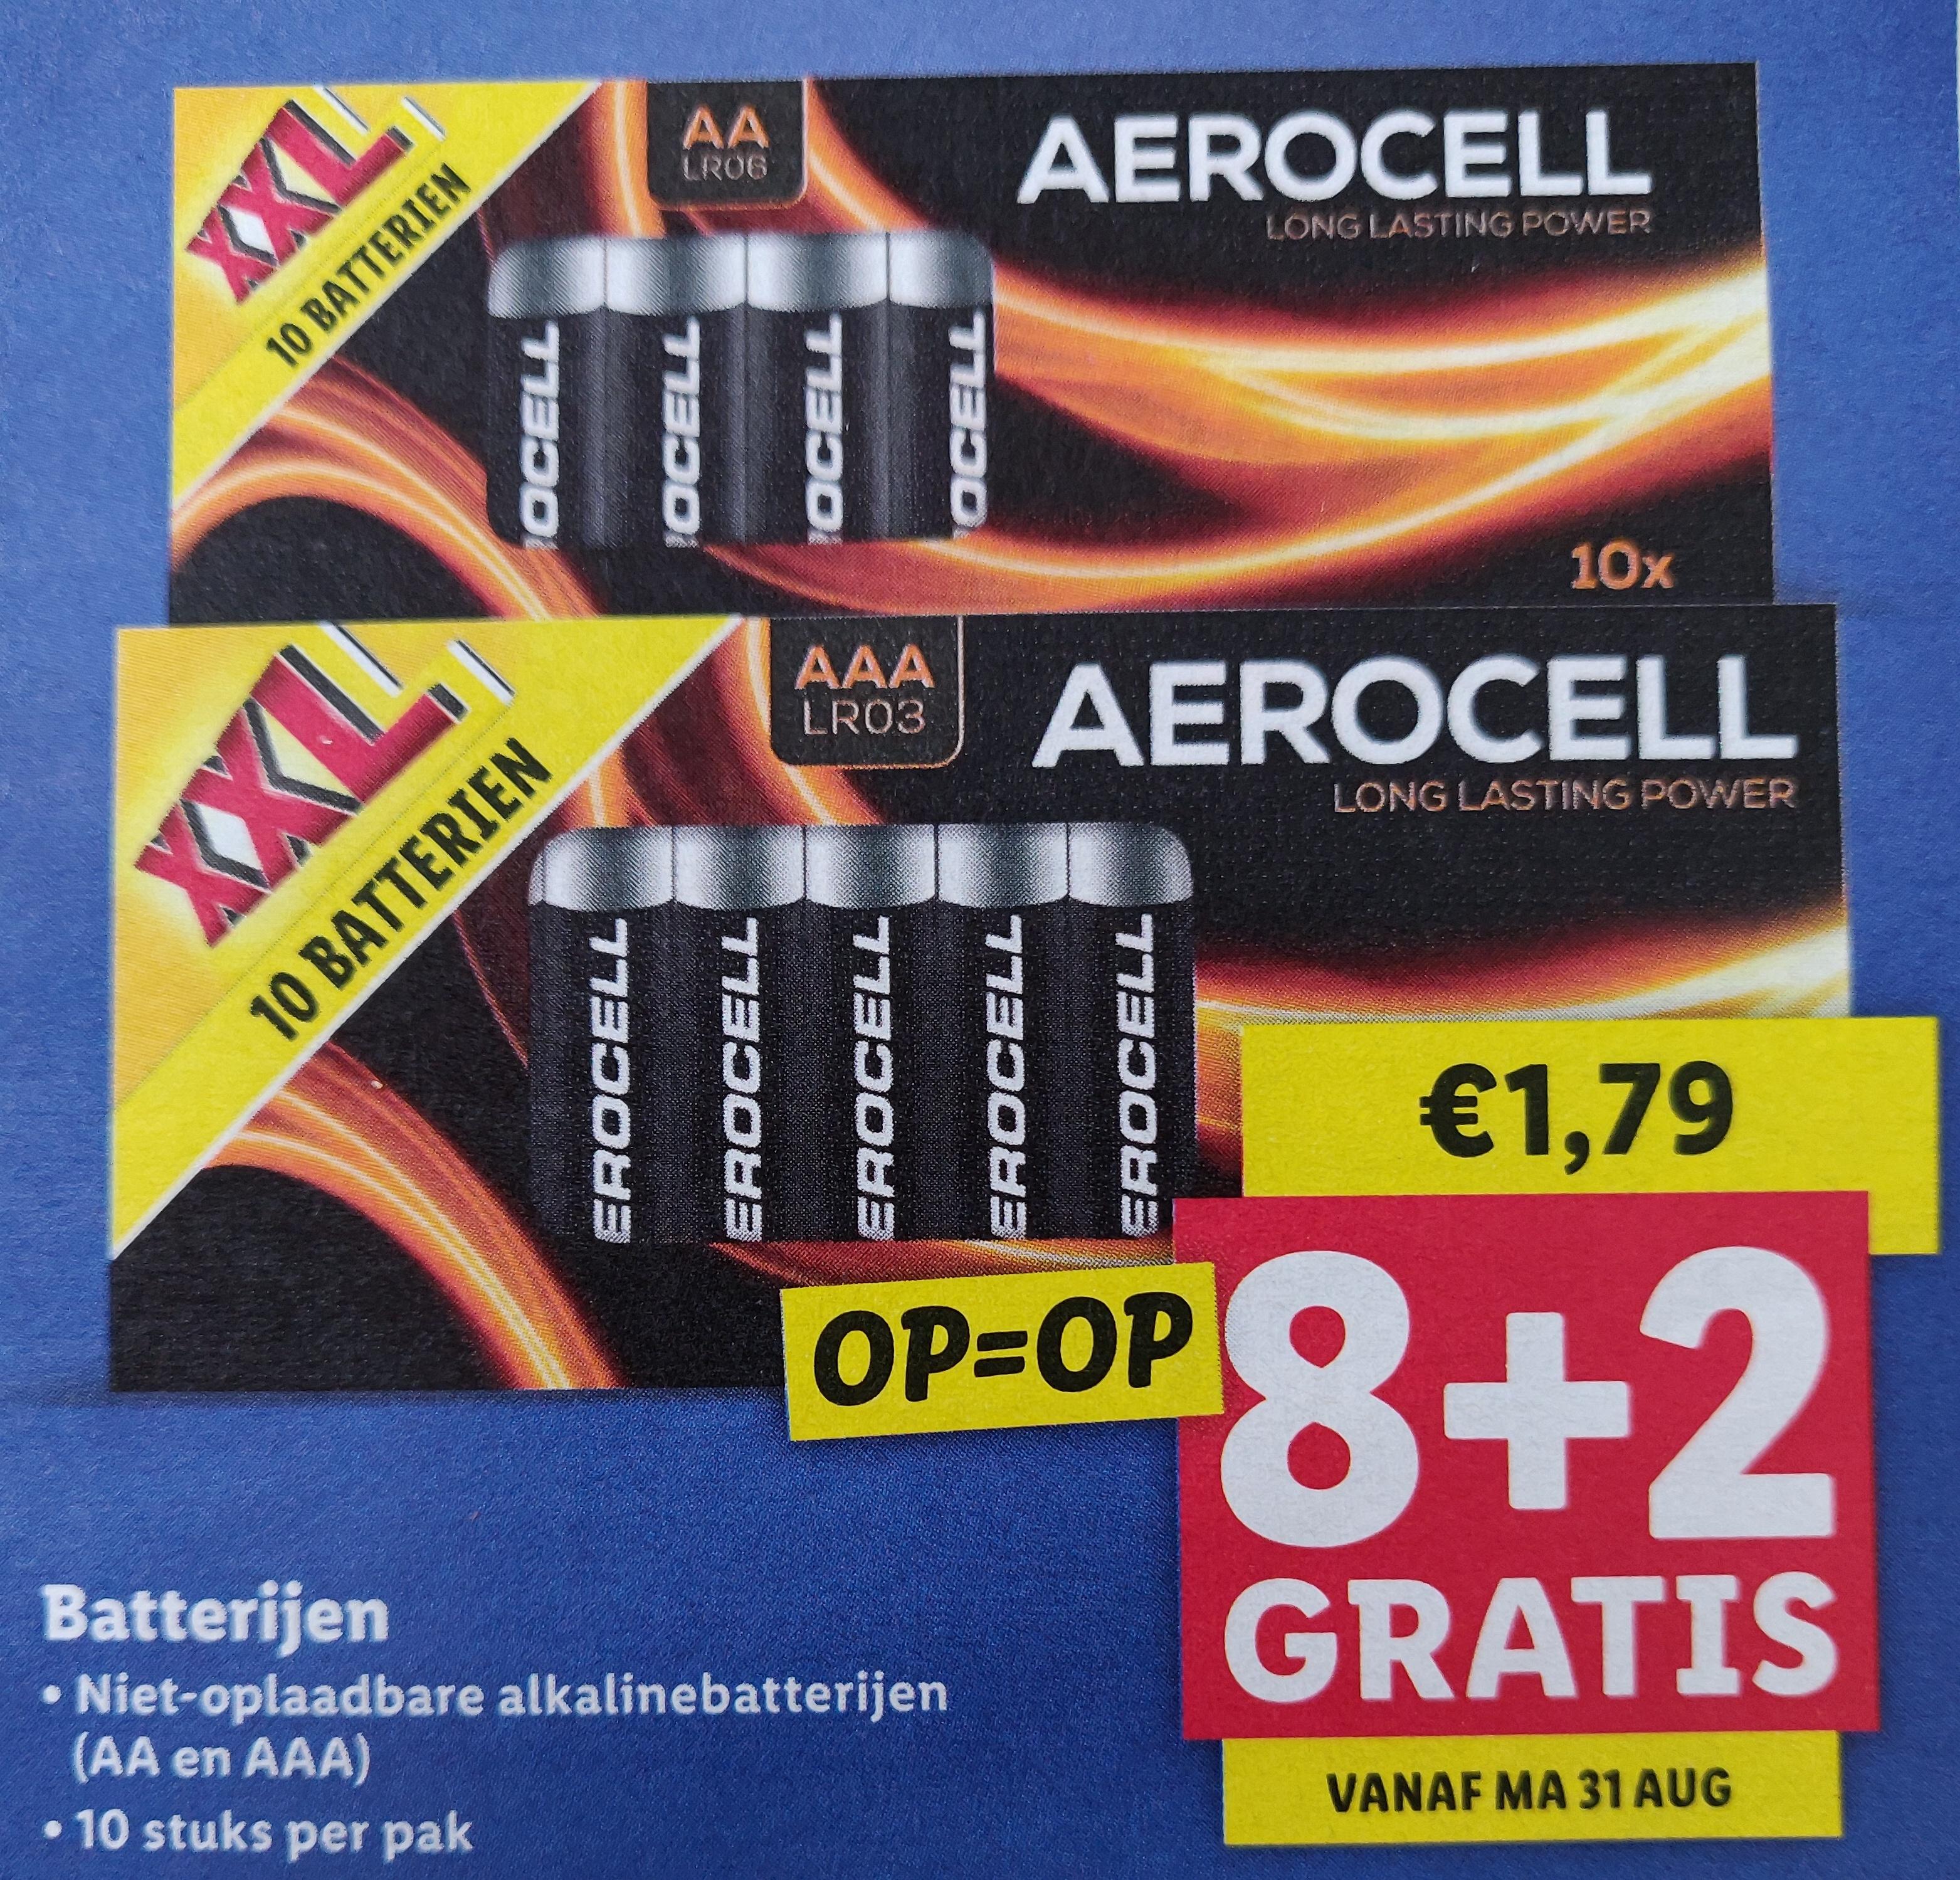 Lidl Aerocell batterijen 8+2 gratis